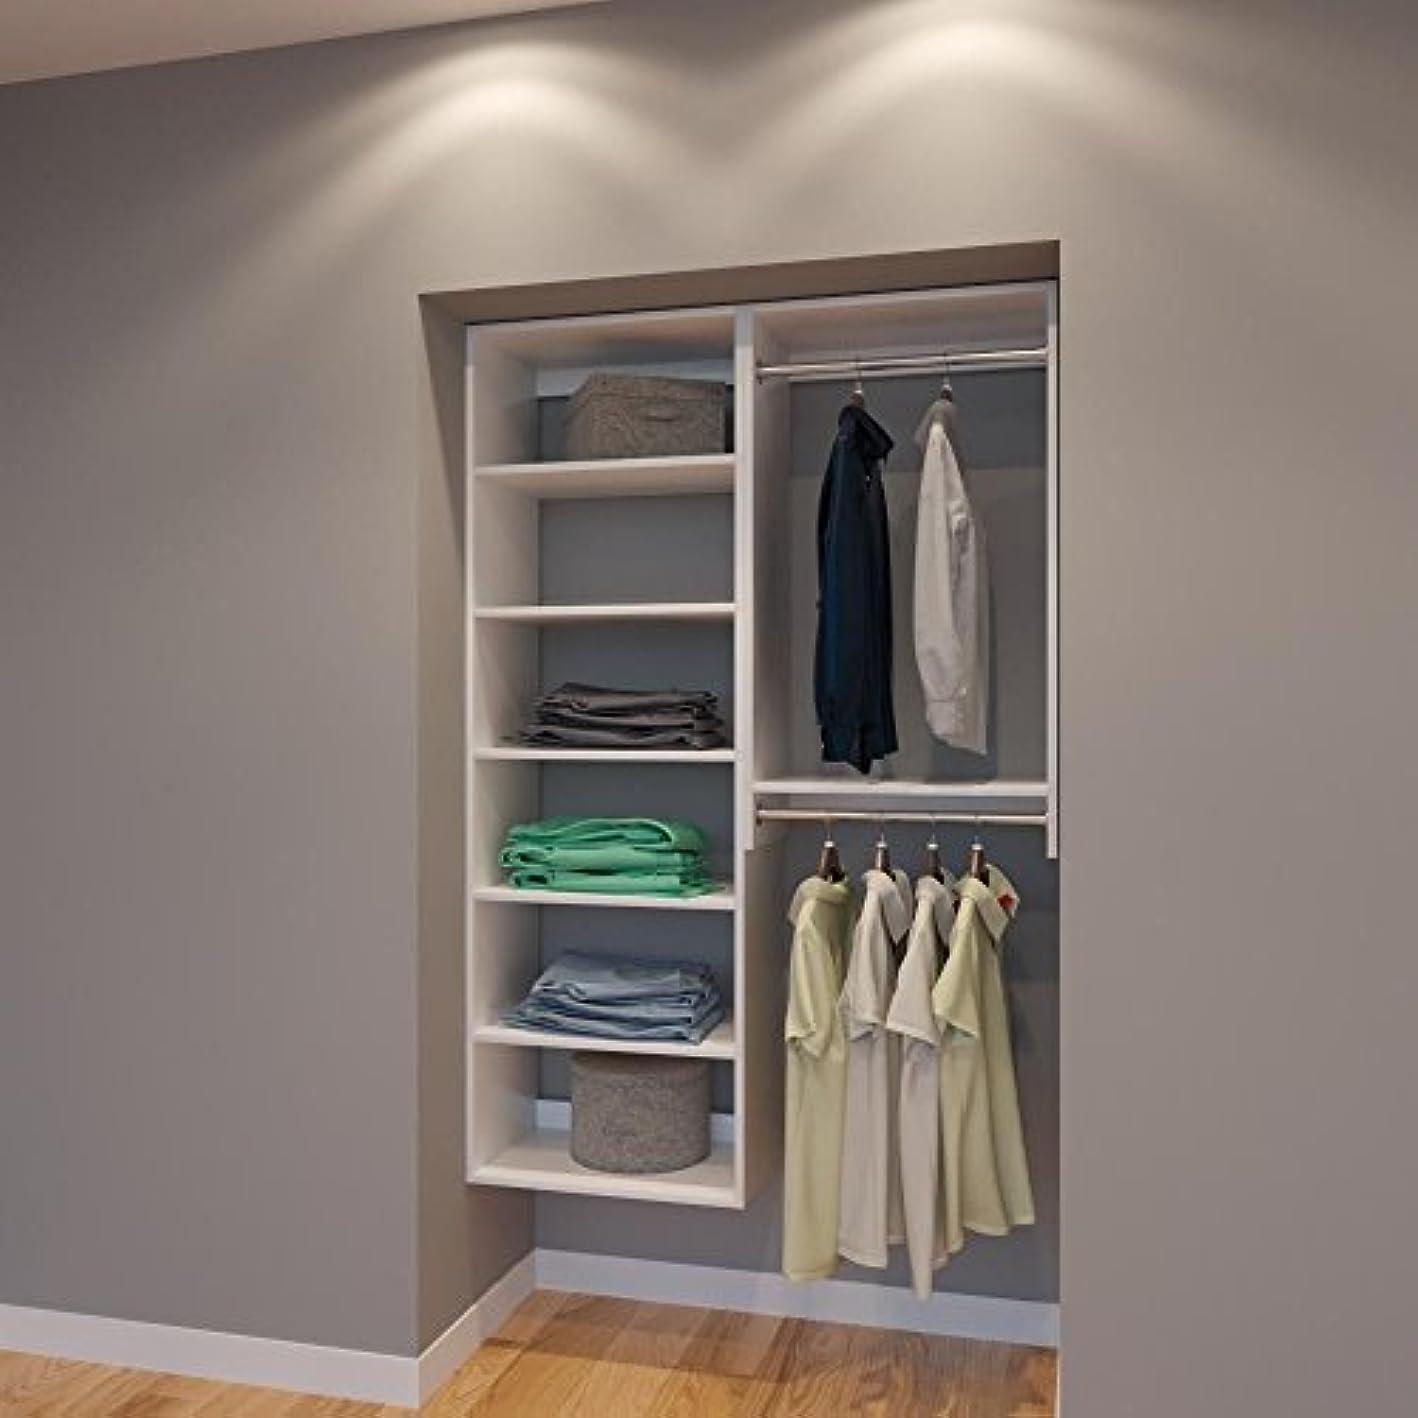 Modular Closets 4 Ft Plywood Closet Organizer System - 48 inch - Style F